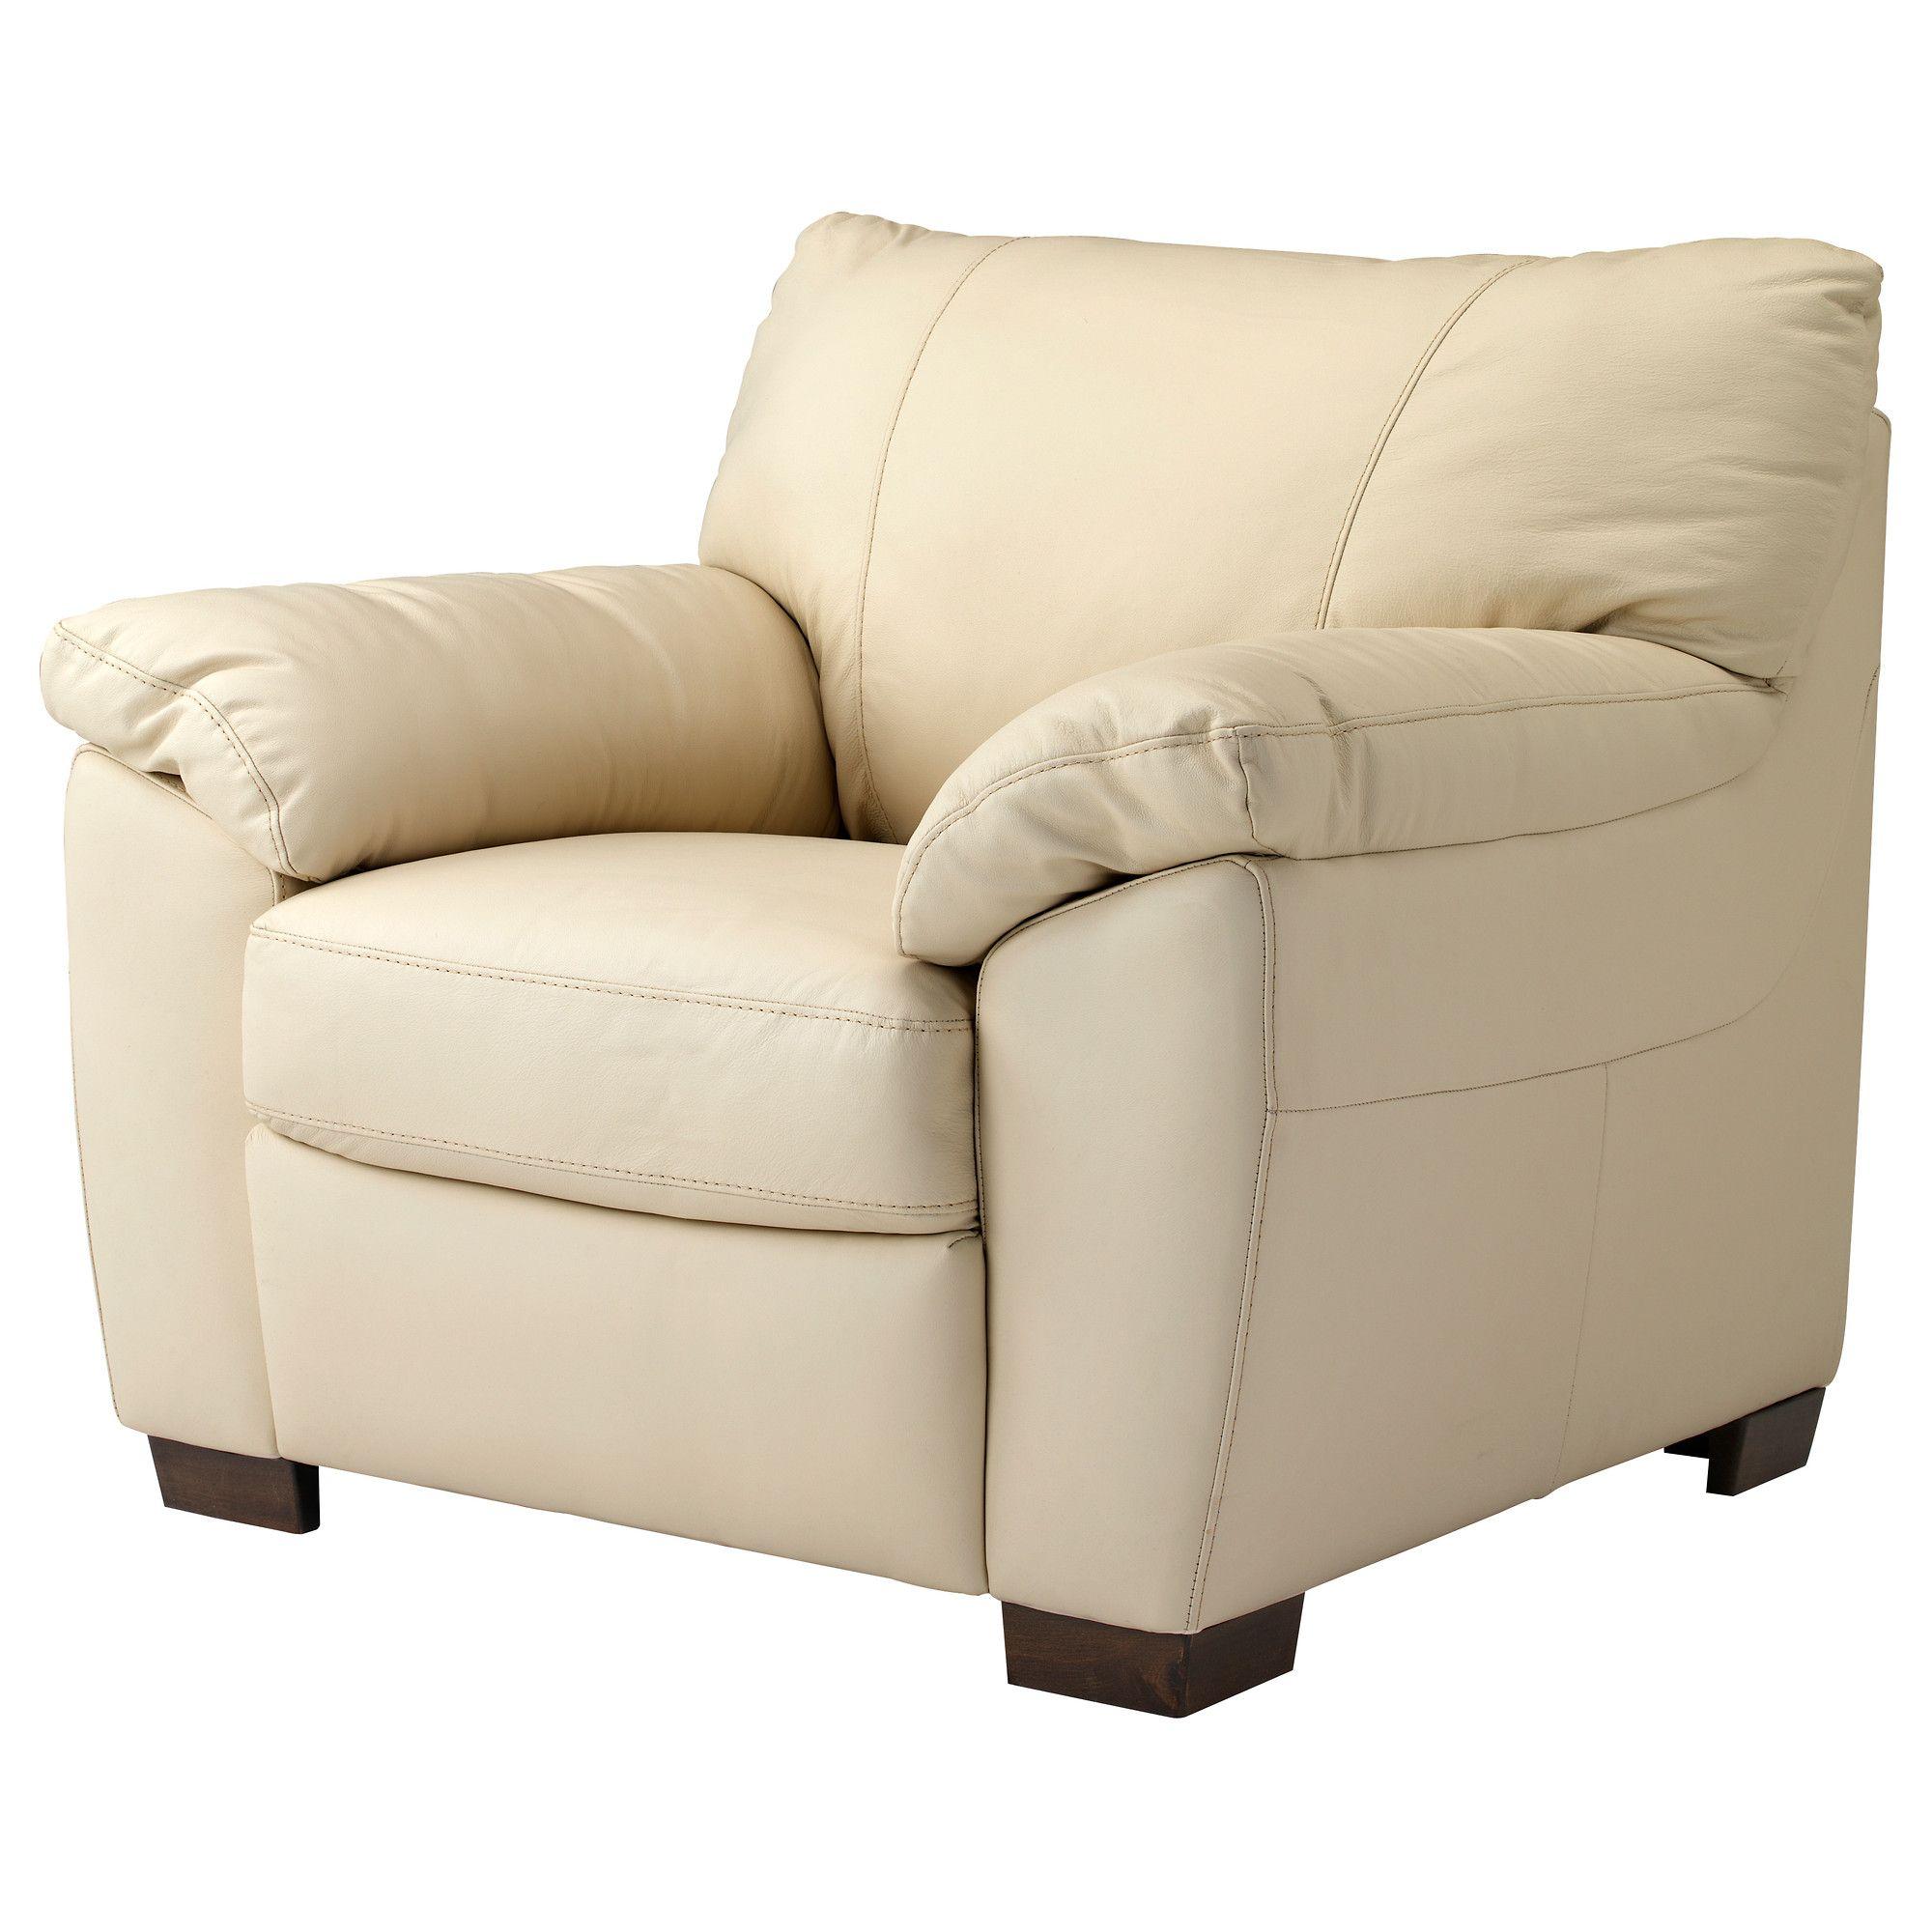 US Furniture and Home Furnishings Ikea leather sofa